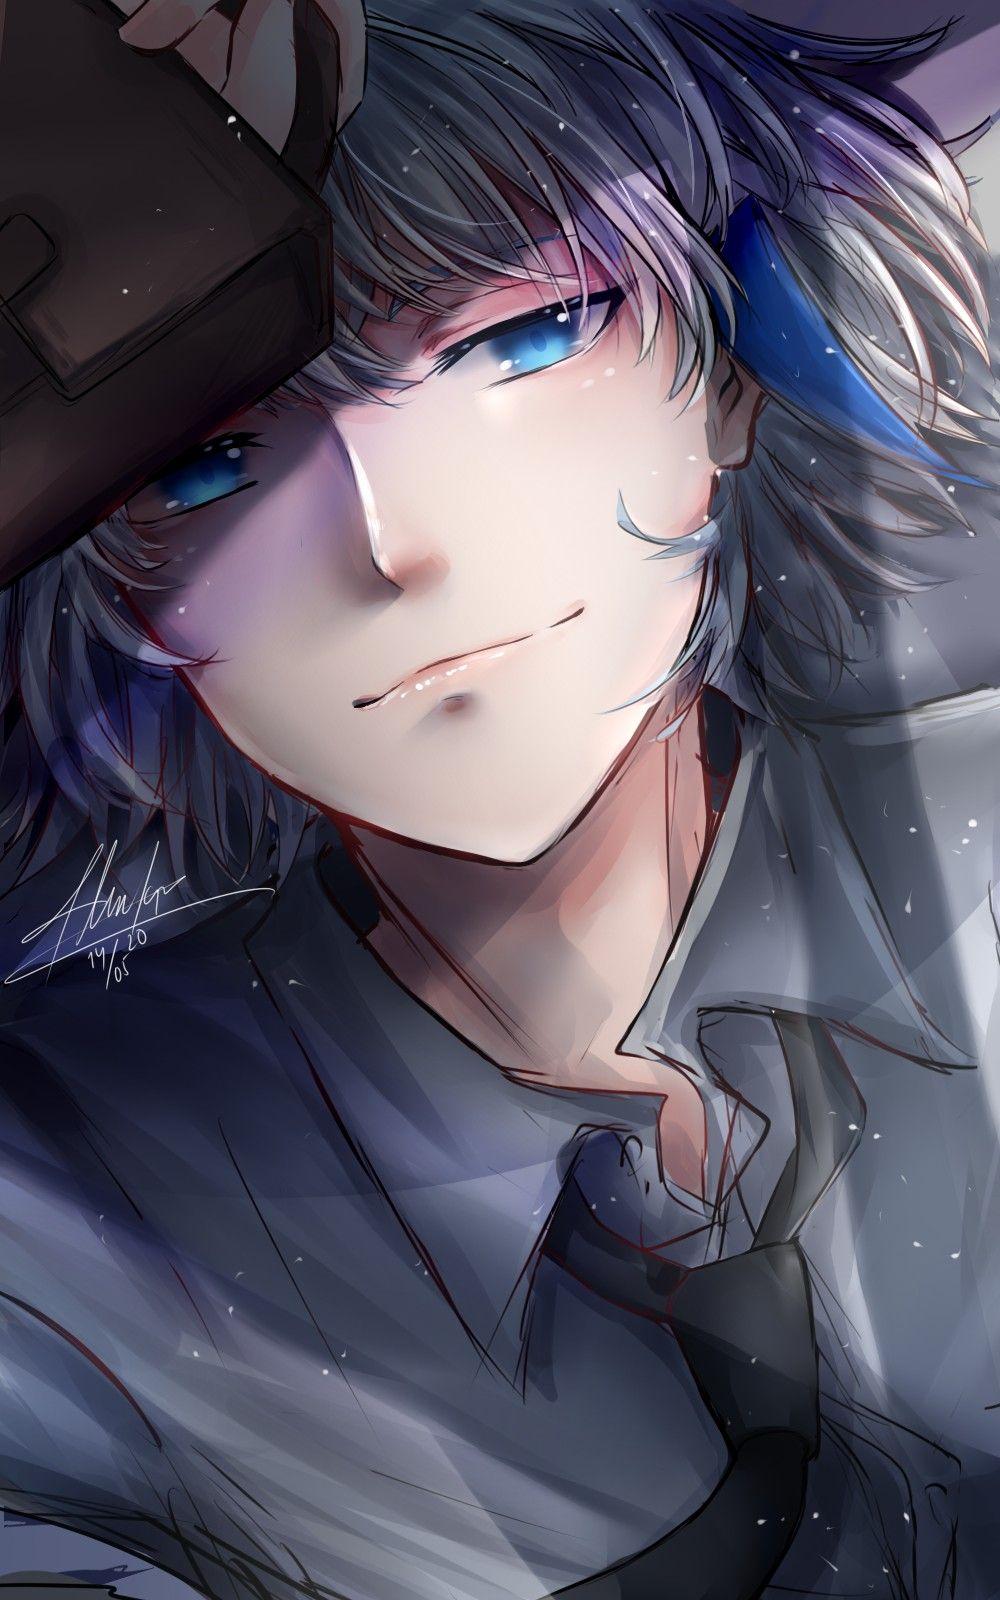 Khun Aguero Agne Kami No Tou Gambar Anime Gambar Karakter Fanart